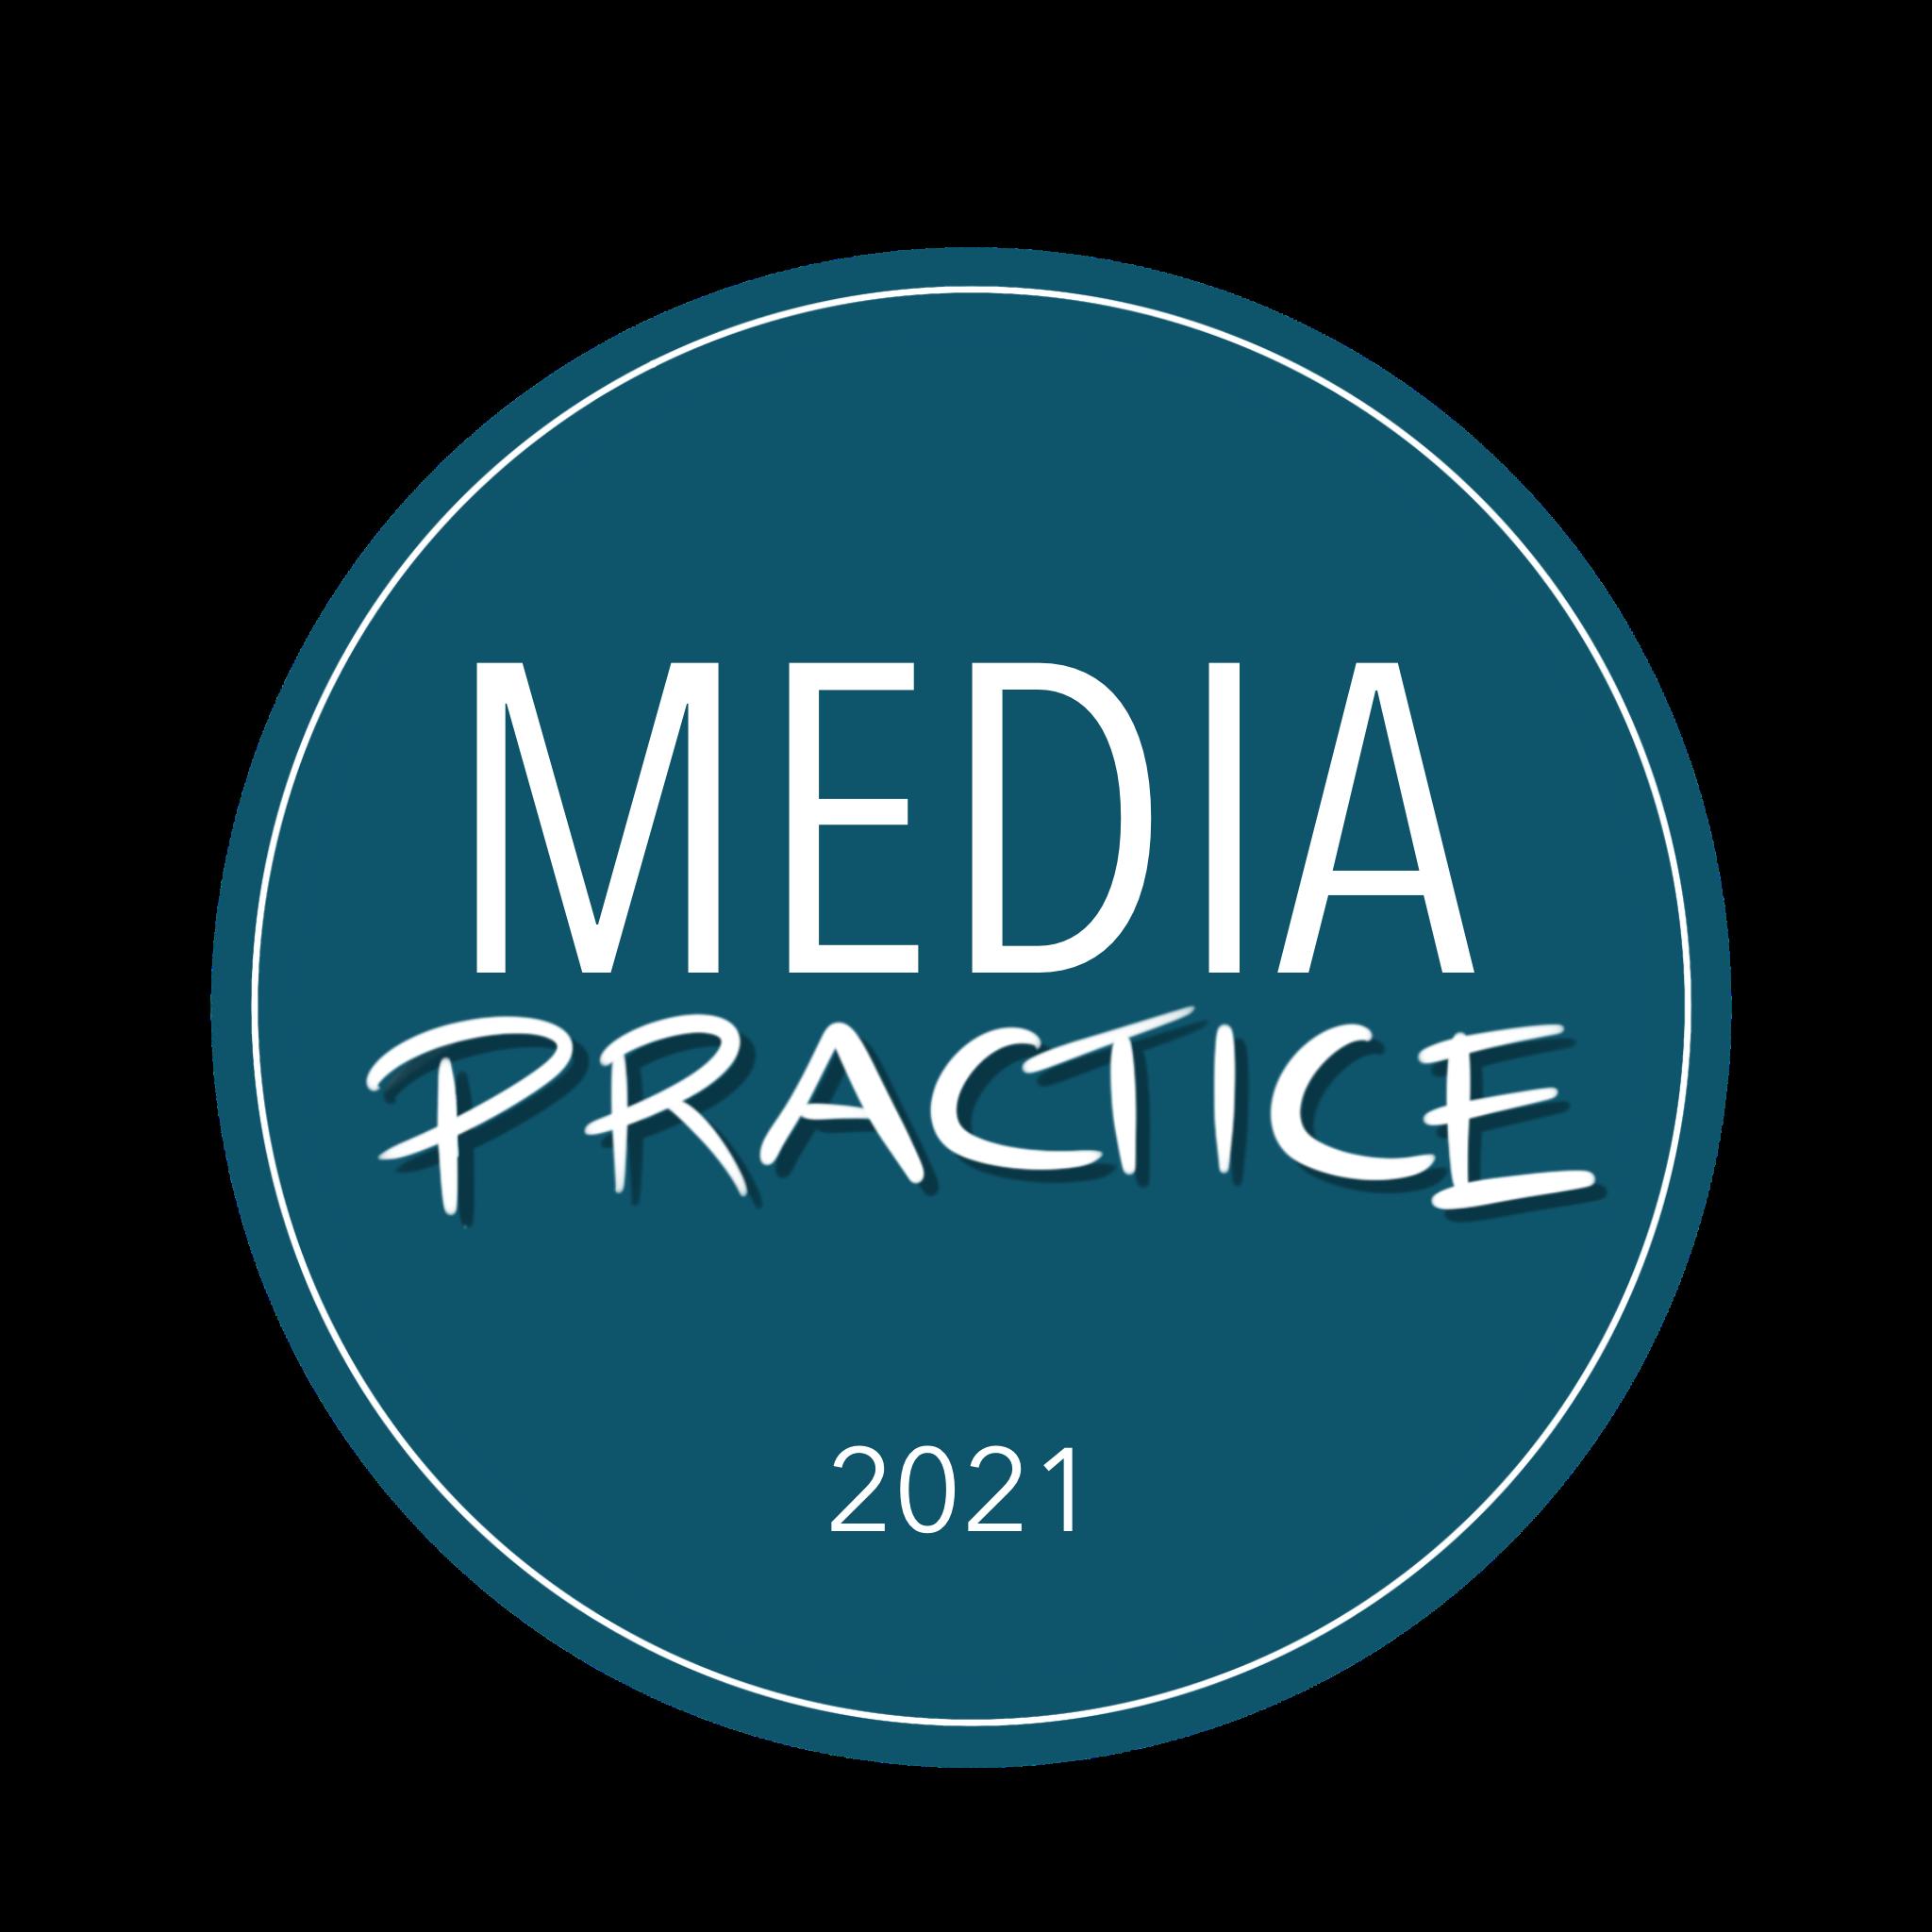 Mediapractice